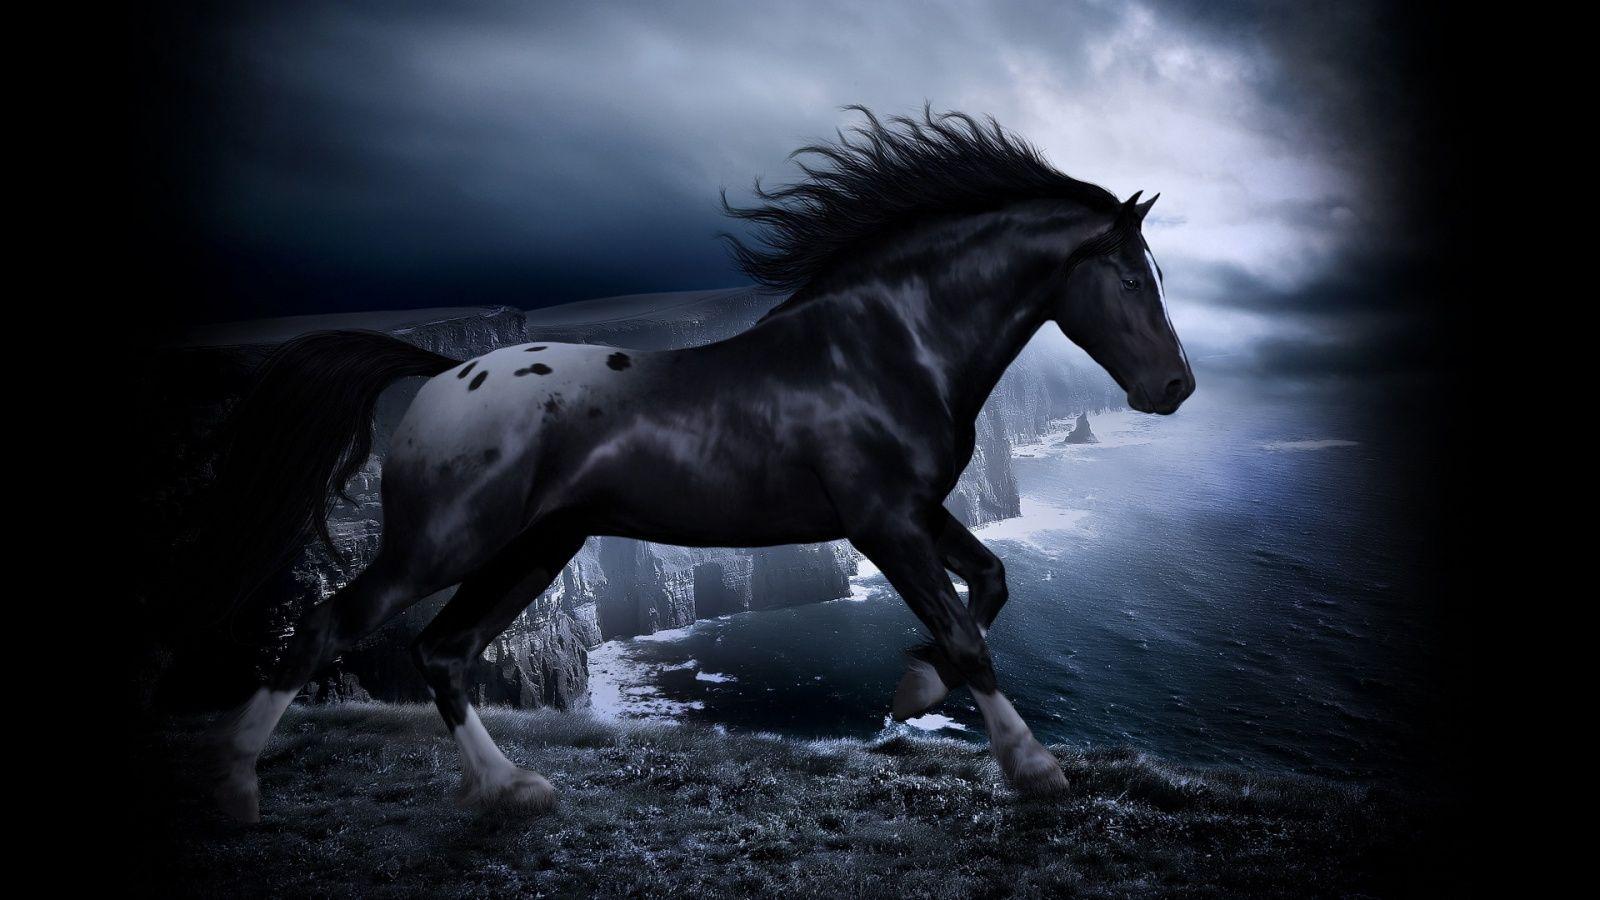 Black Spotted Horse Horse Wallpaper Horses Beautiful Horses